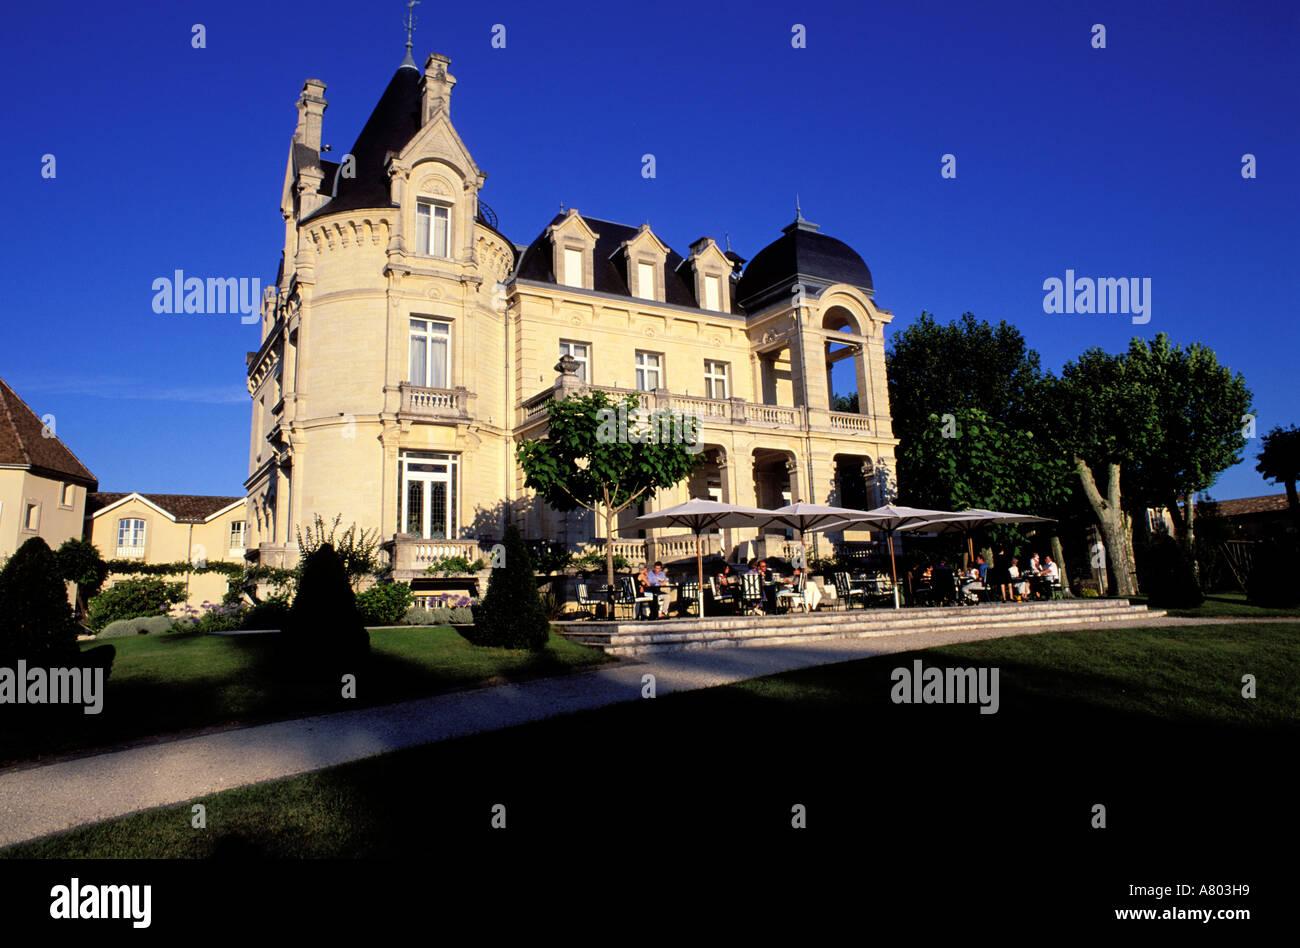 france gironde saint emilion grand barrail castle hotel bordeaux stock photo royalty free. Black Bedroom Furniture Sets. Home Design Ideas